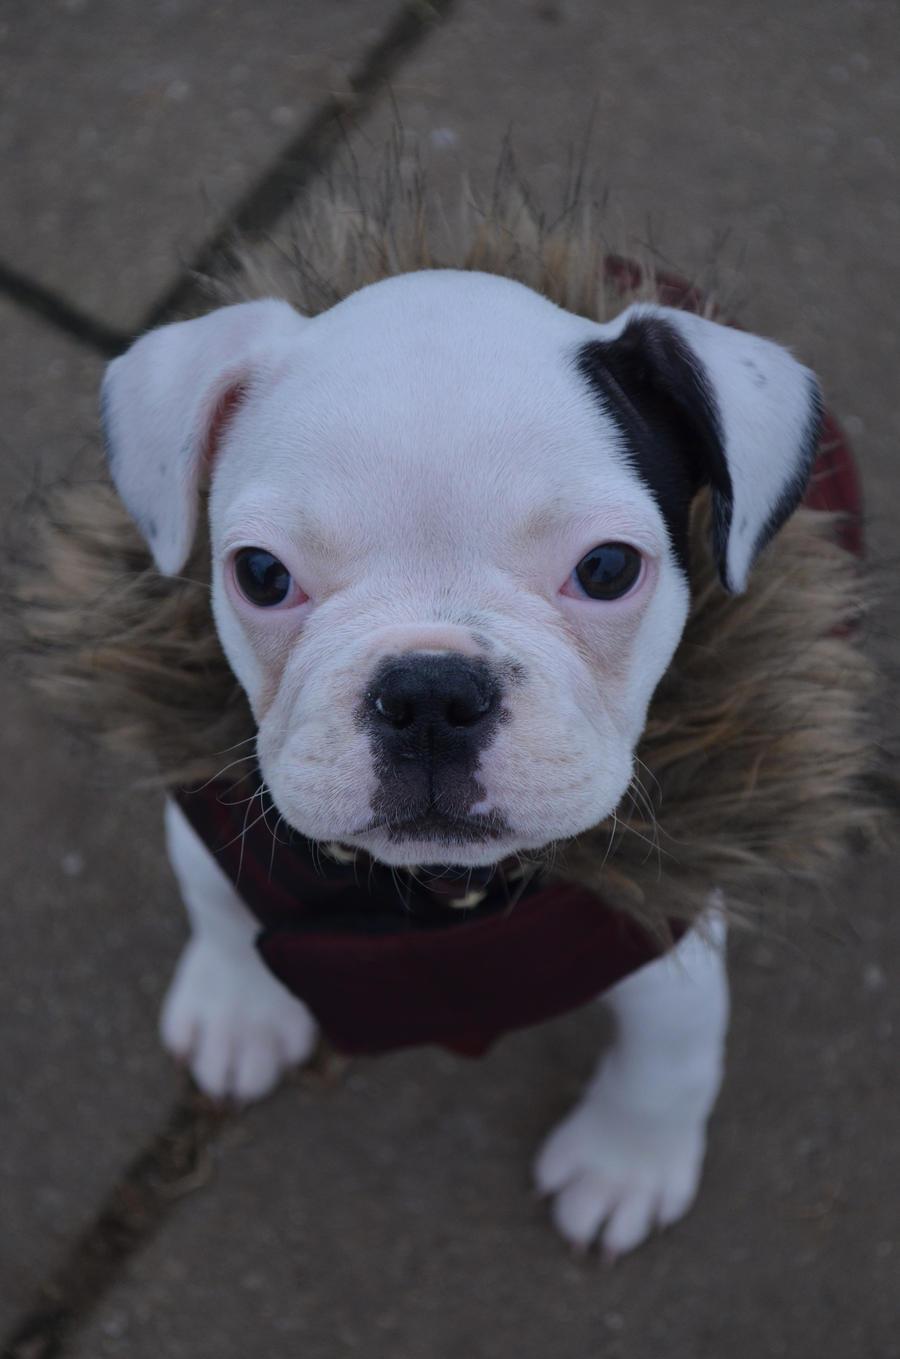 French Bulldog Puppy witch Jacket by Mayli909